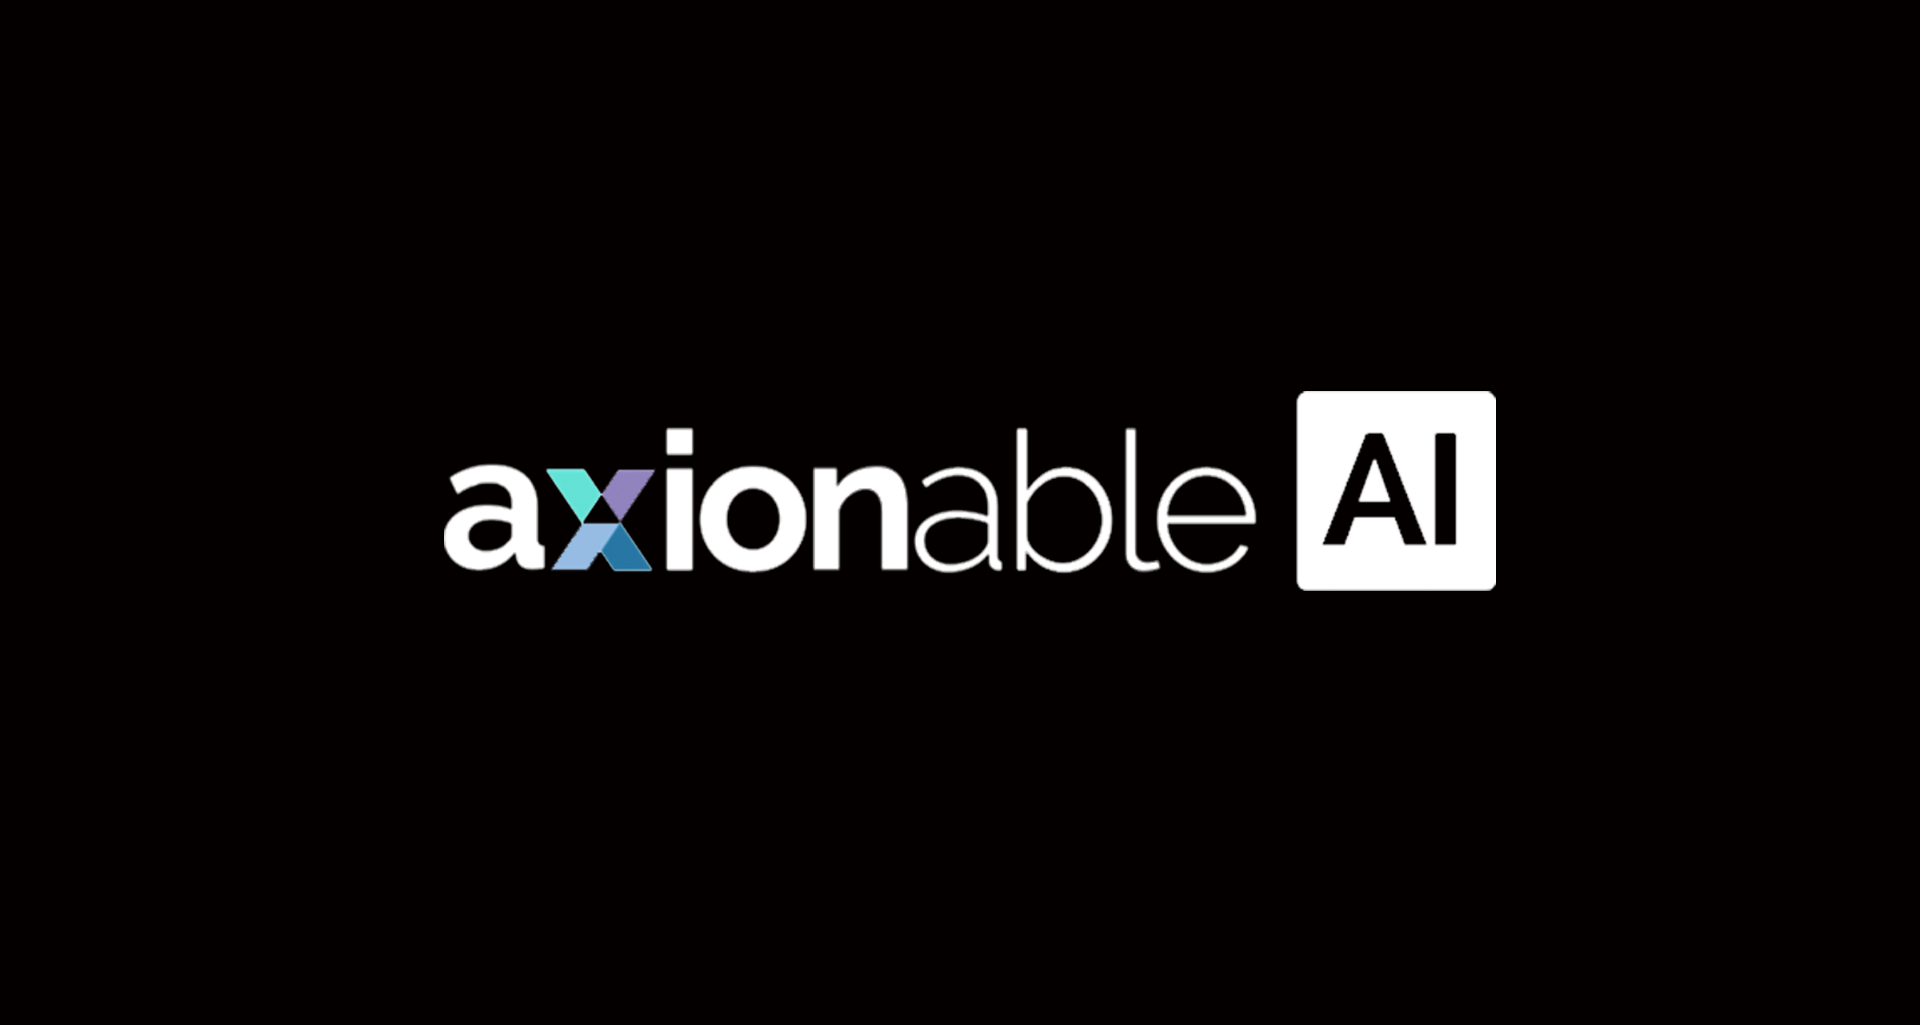 Axionable AI